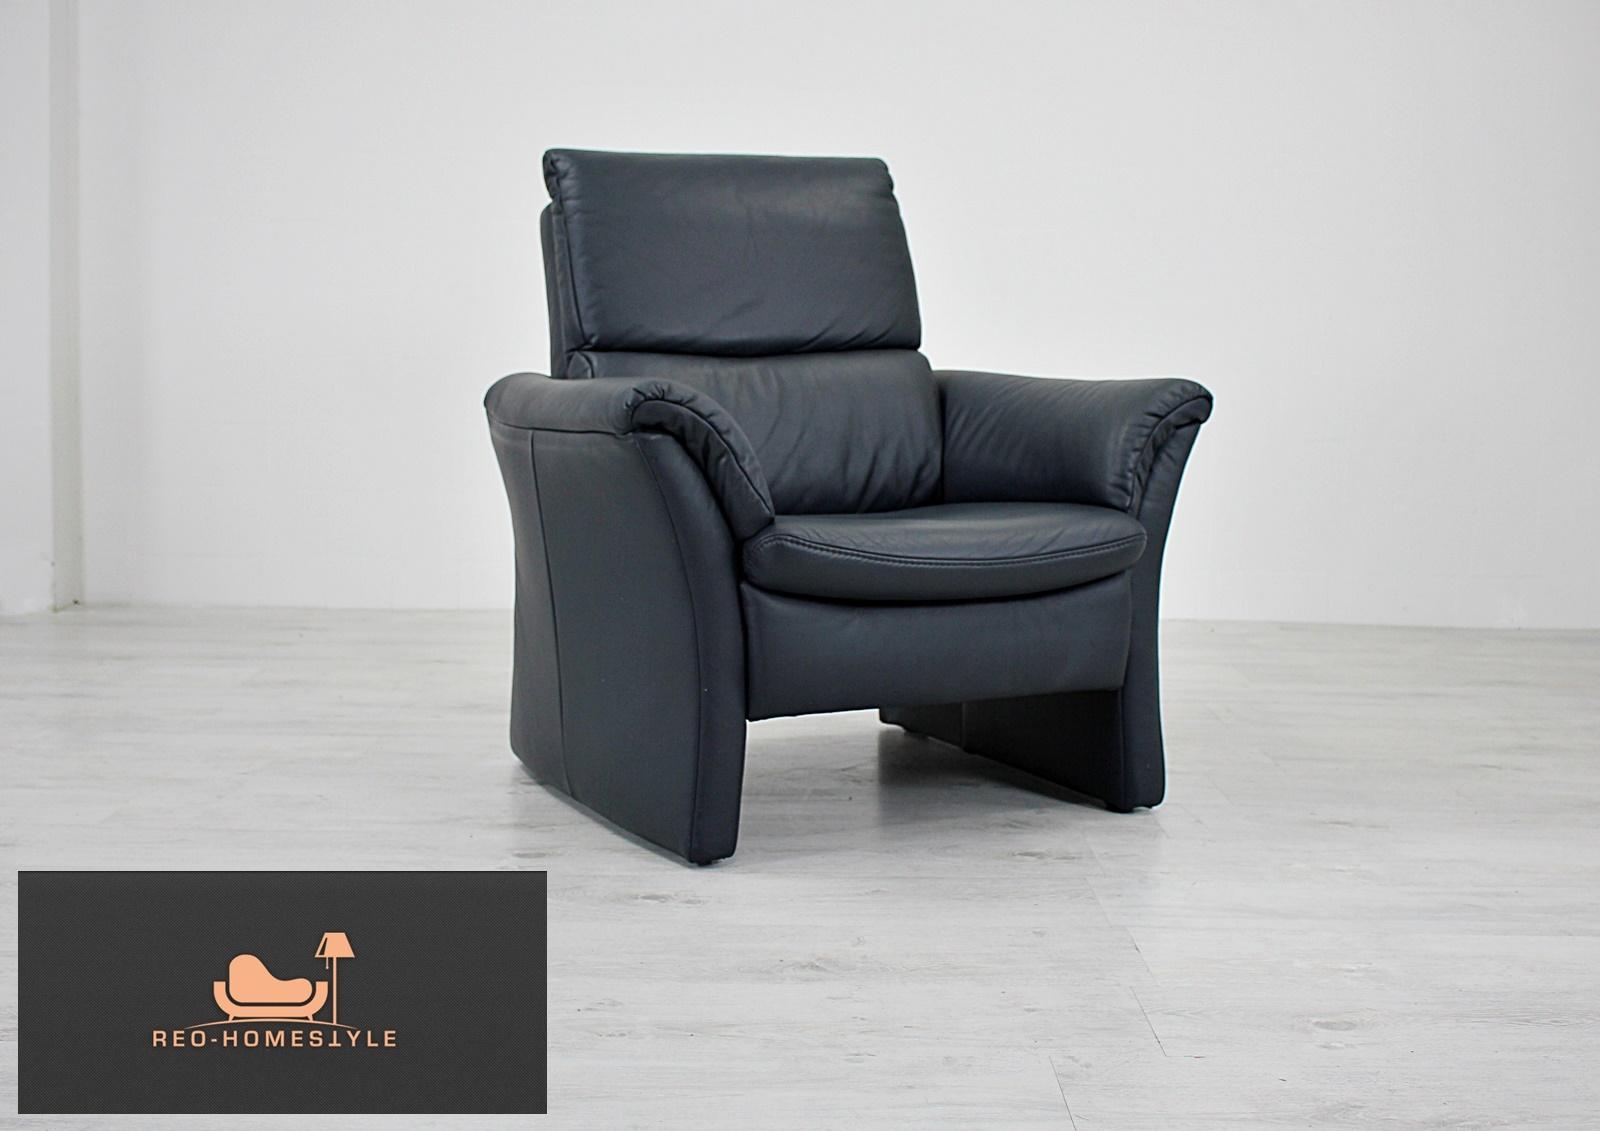 Full Size of Himolla Sofa Sale Clearance Uk Designer Sessel Couch Leder Dunkelblau Echtleder Englisch Brühl Günstiges Abnehmbarer Bezug Recamiere Kaufen Günstig überzug Sofa Himolla Sofa